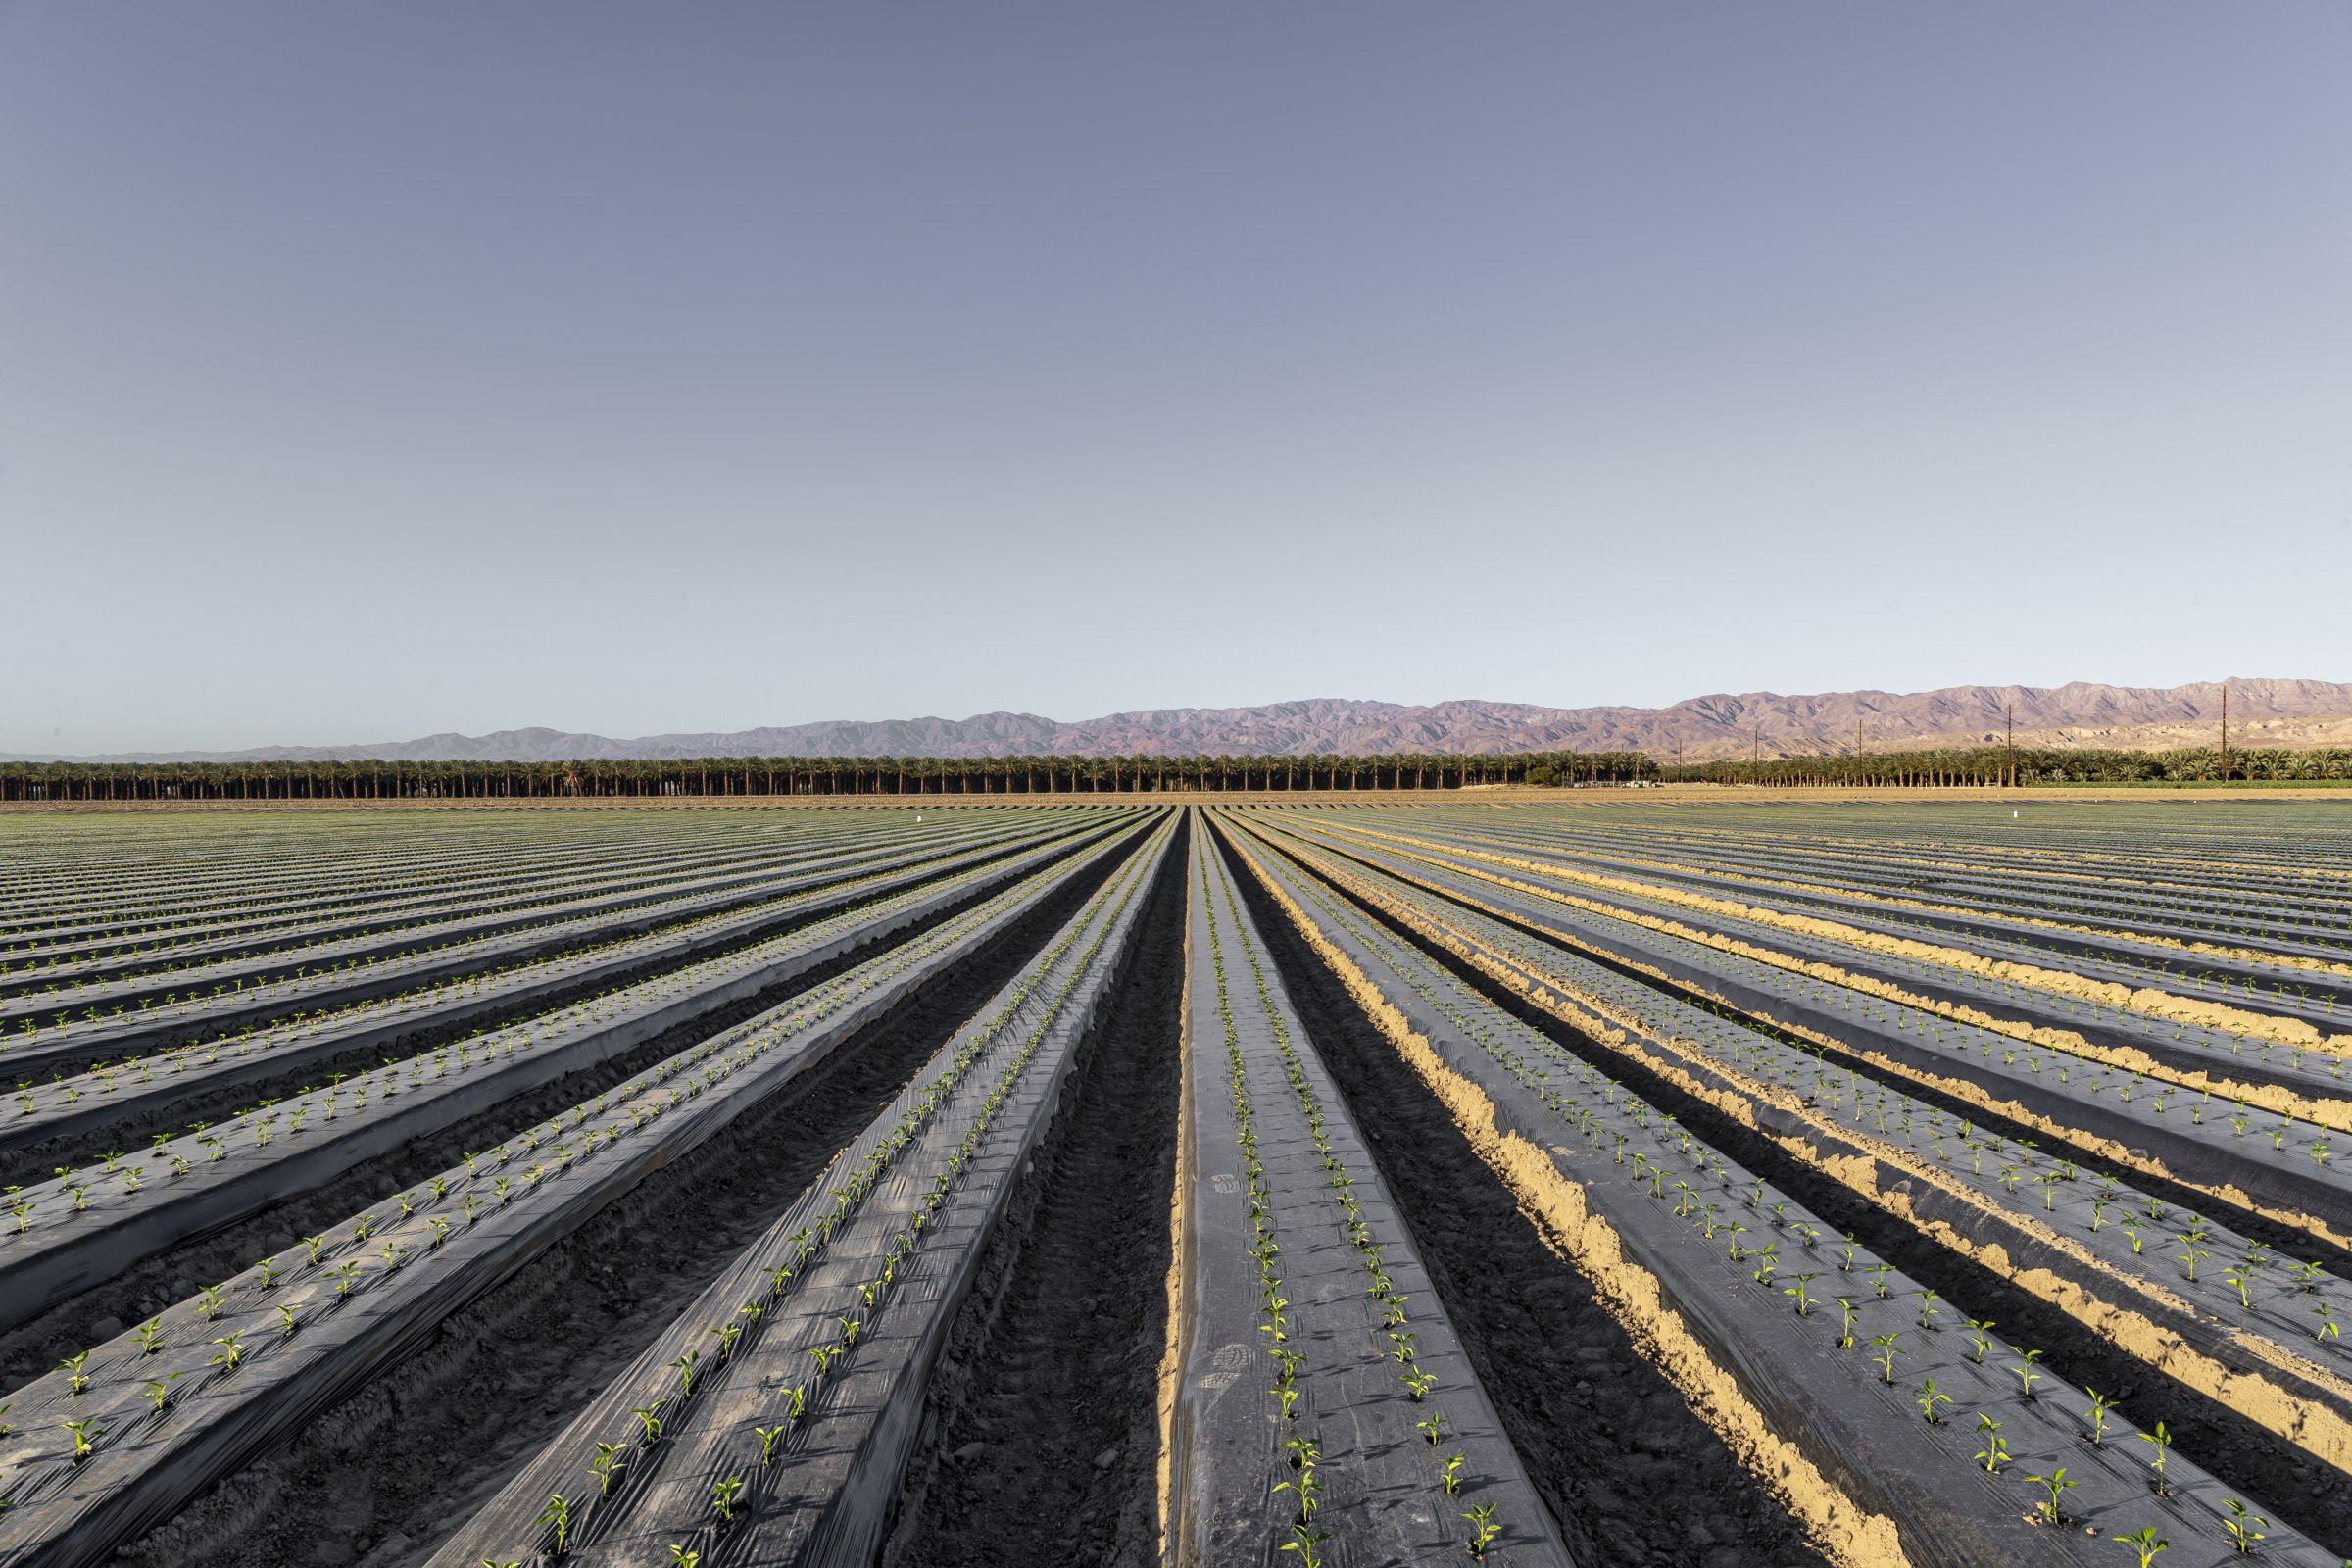 riverside-county-california-118-acres-listing-number-15577-0-2021-06-09-193627.jpg